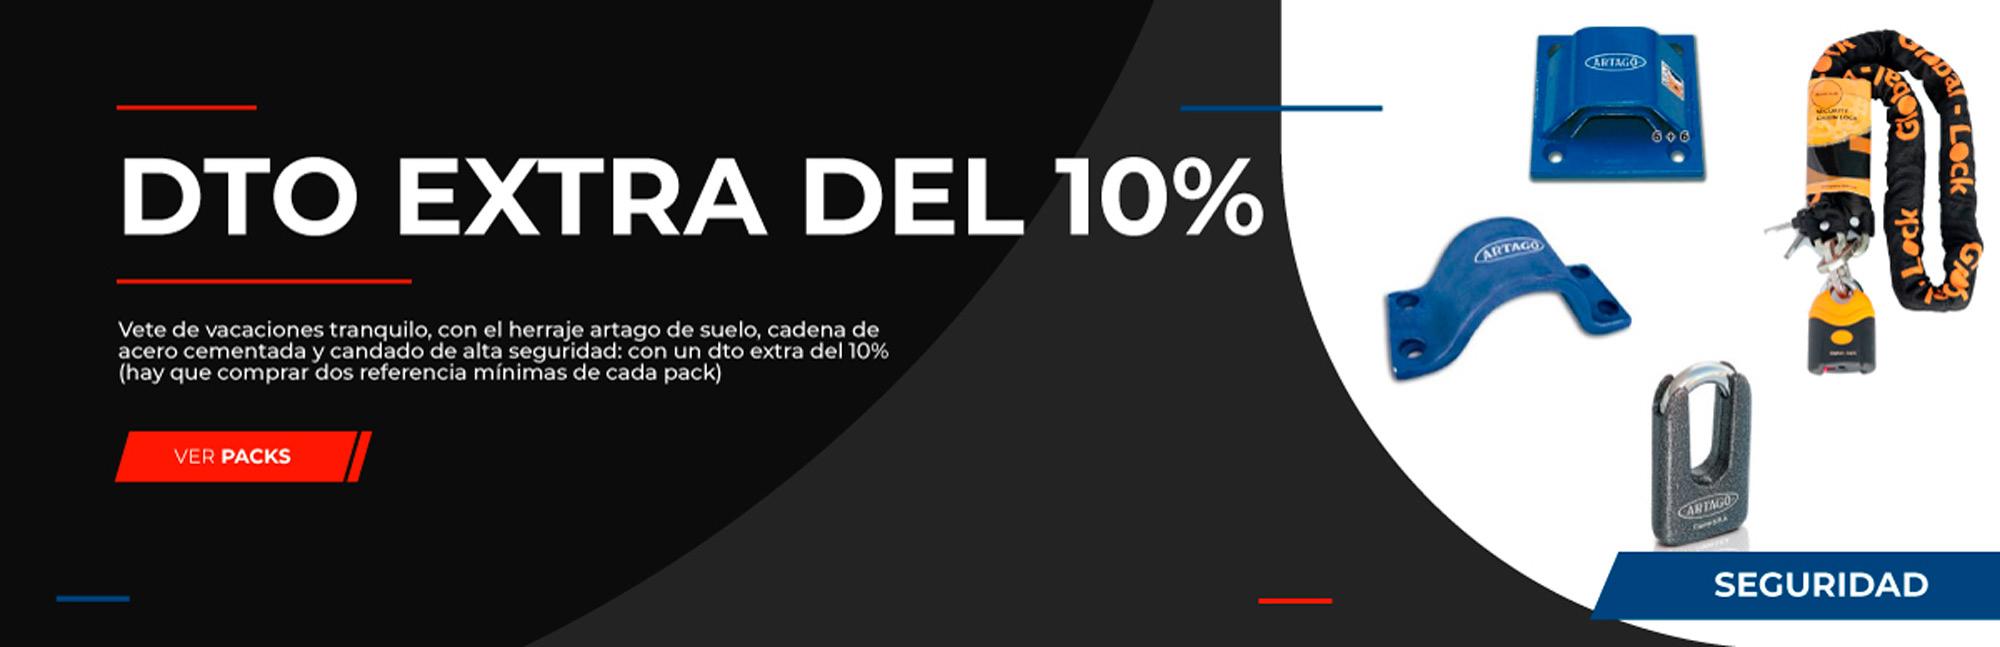 descuento extra 10%